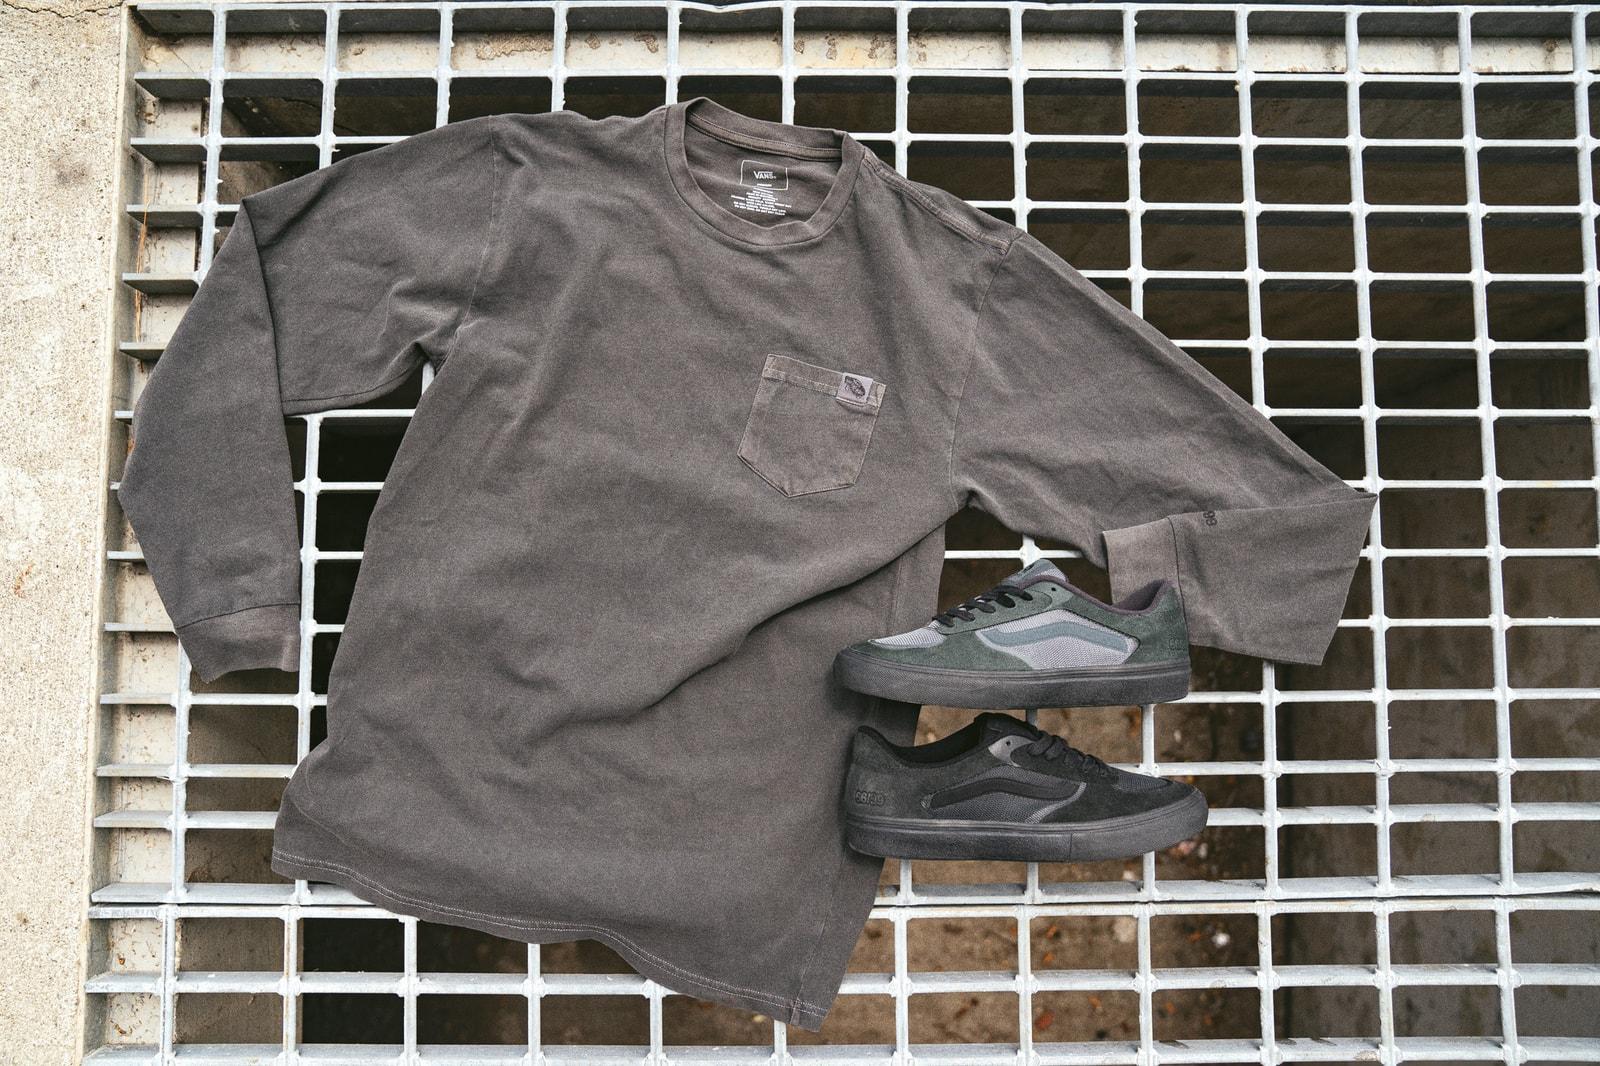 VANS RELEASES ROWLEY RAPIDWELD PRO LTD—INSPIRED BY '90S FOOTWEAR DESIGN